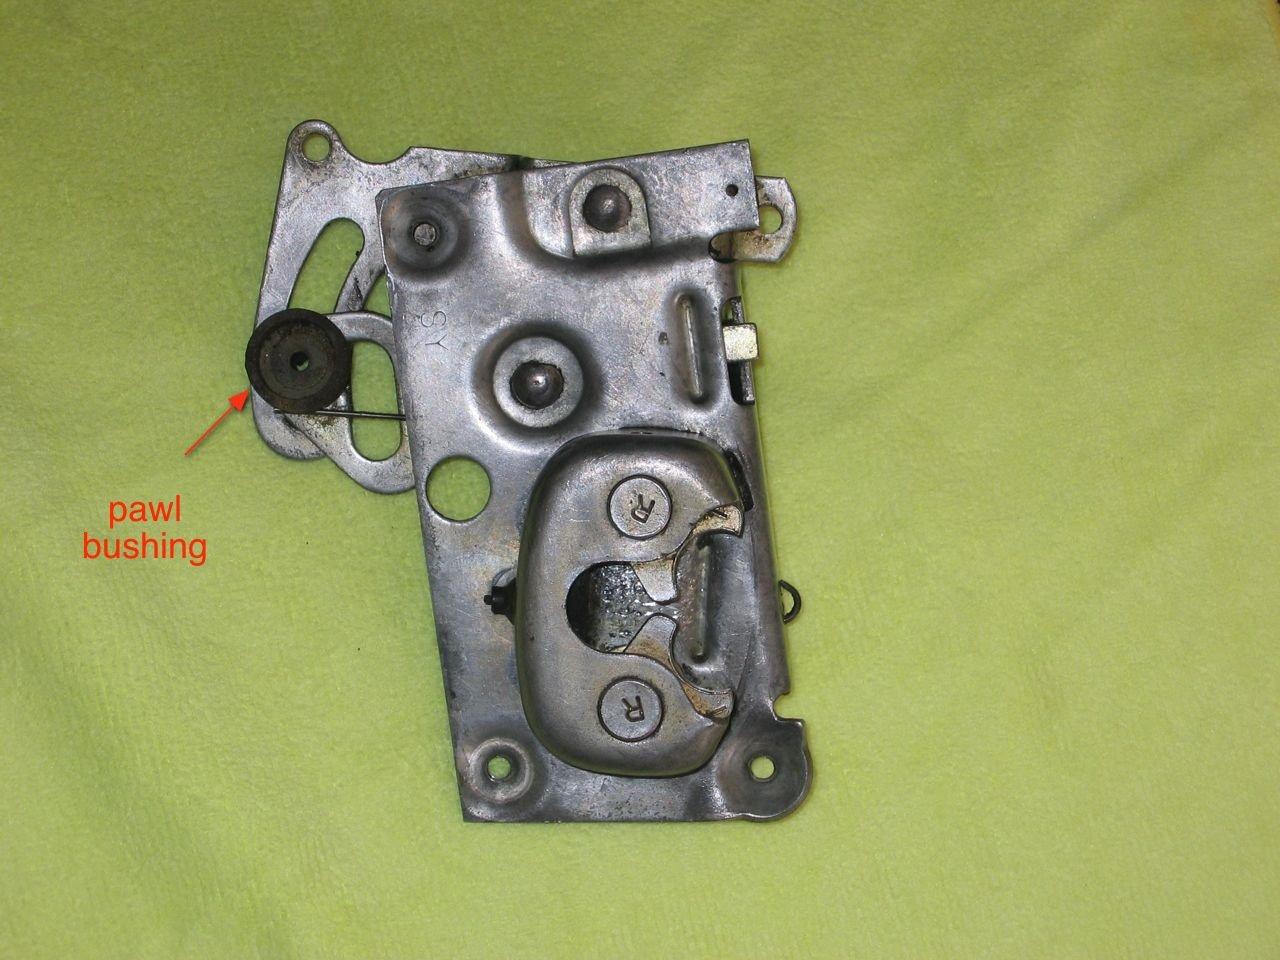 1967 Mustang Door Lock Diagram Electrical Wiring Diagrams Latch Electricity 1963 Impala 1965